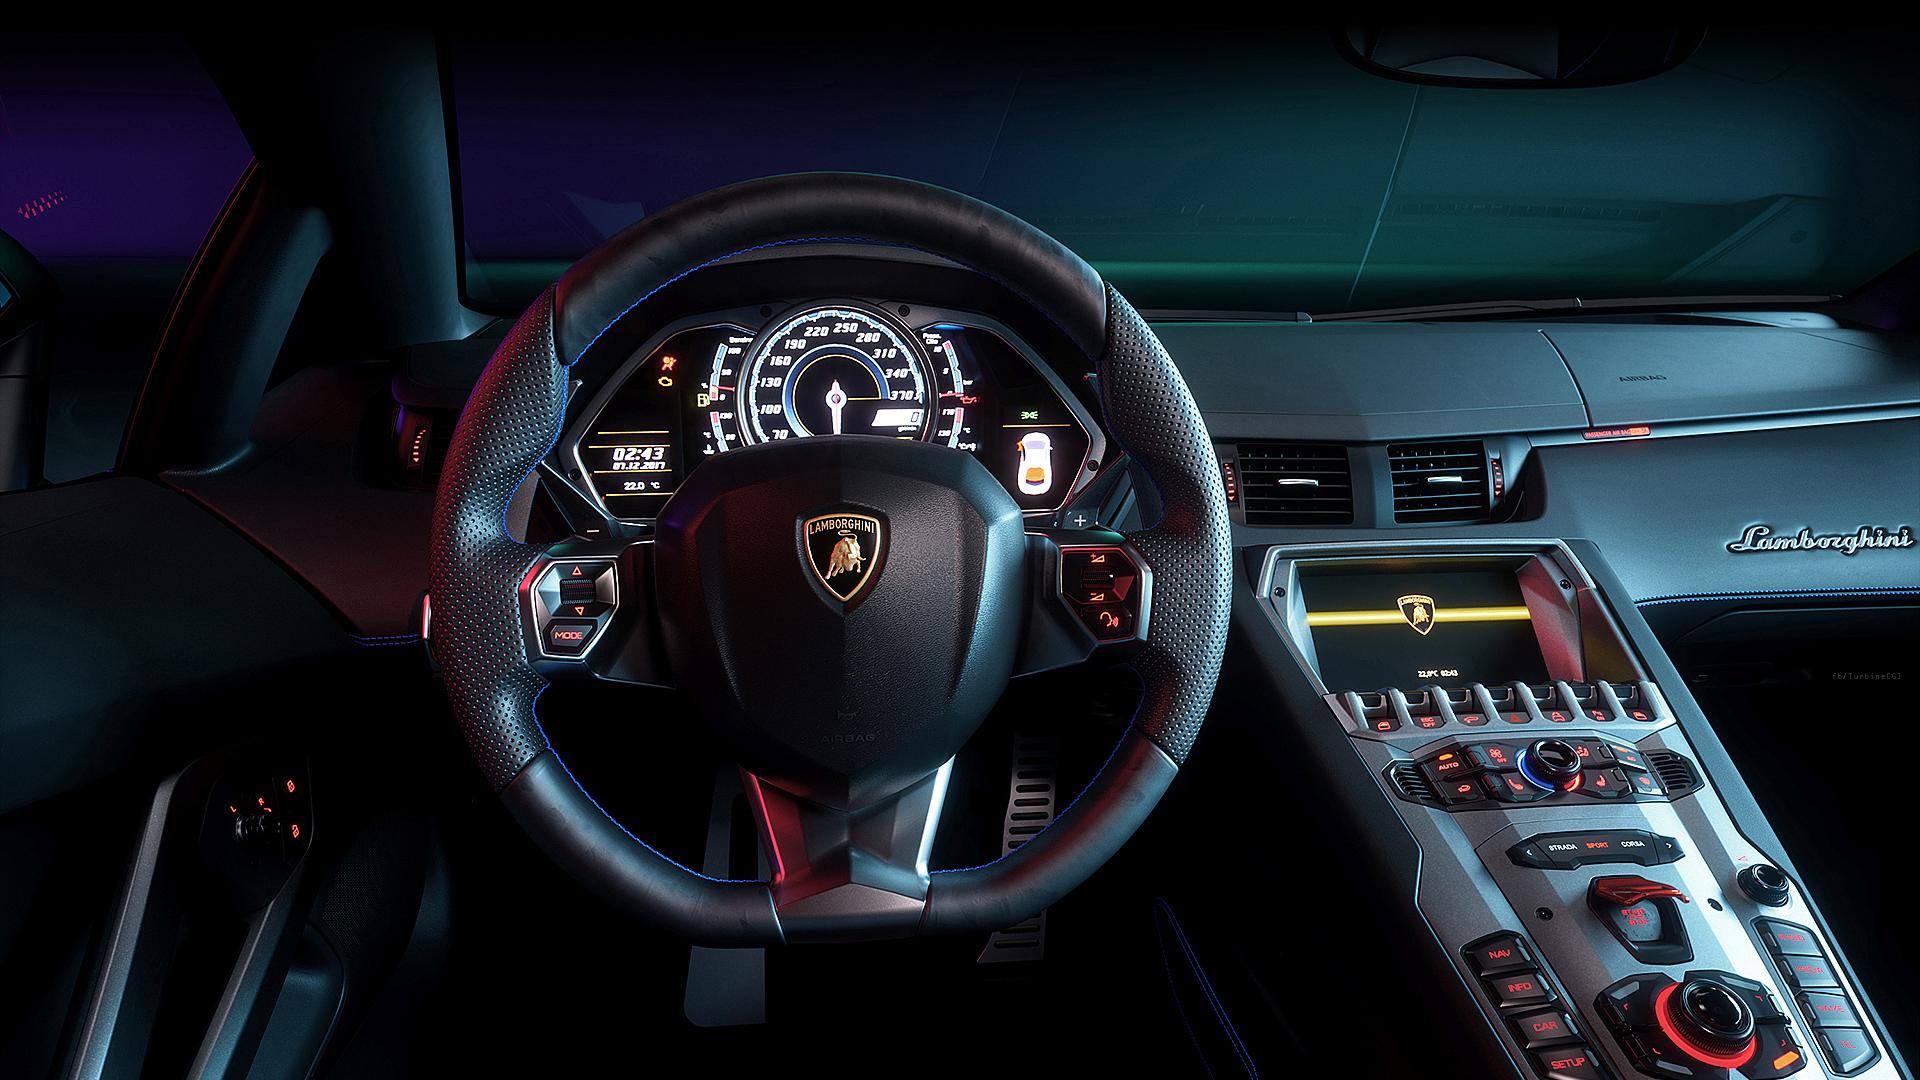 Lamborghini Aventador Interior Cgi Wallpaper Hd Car